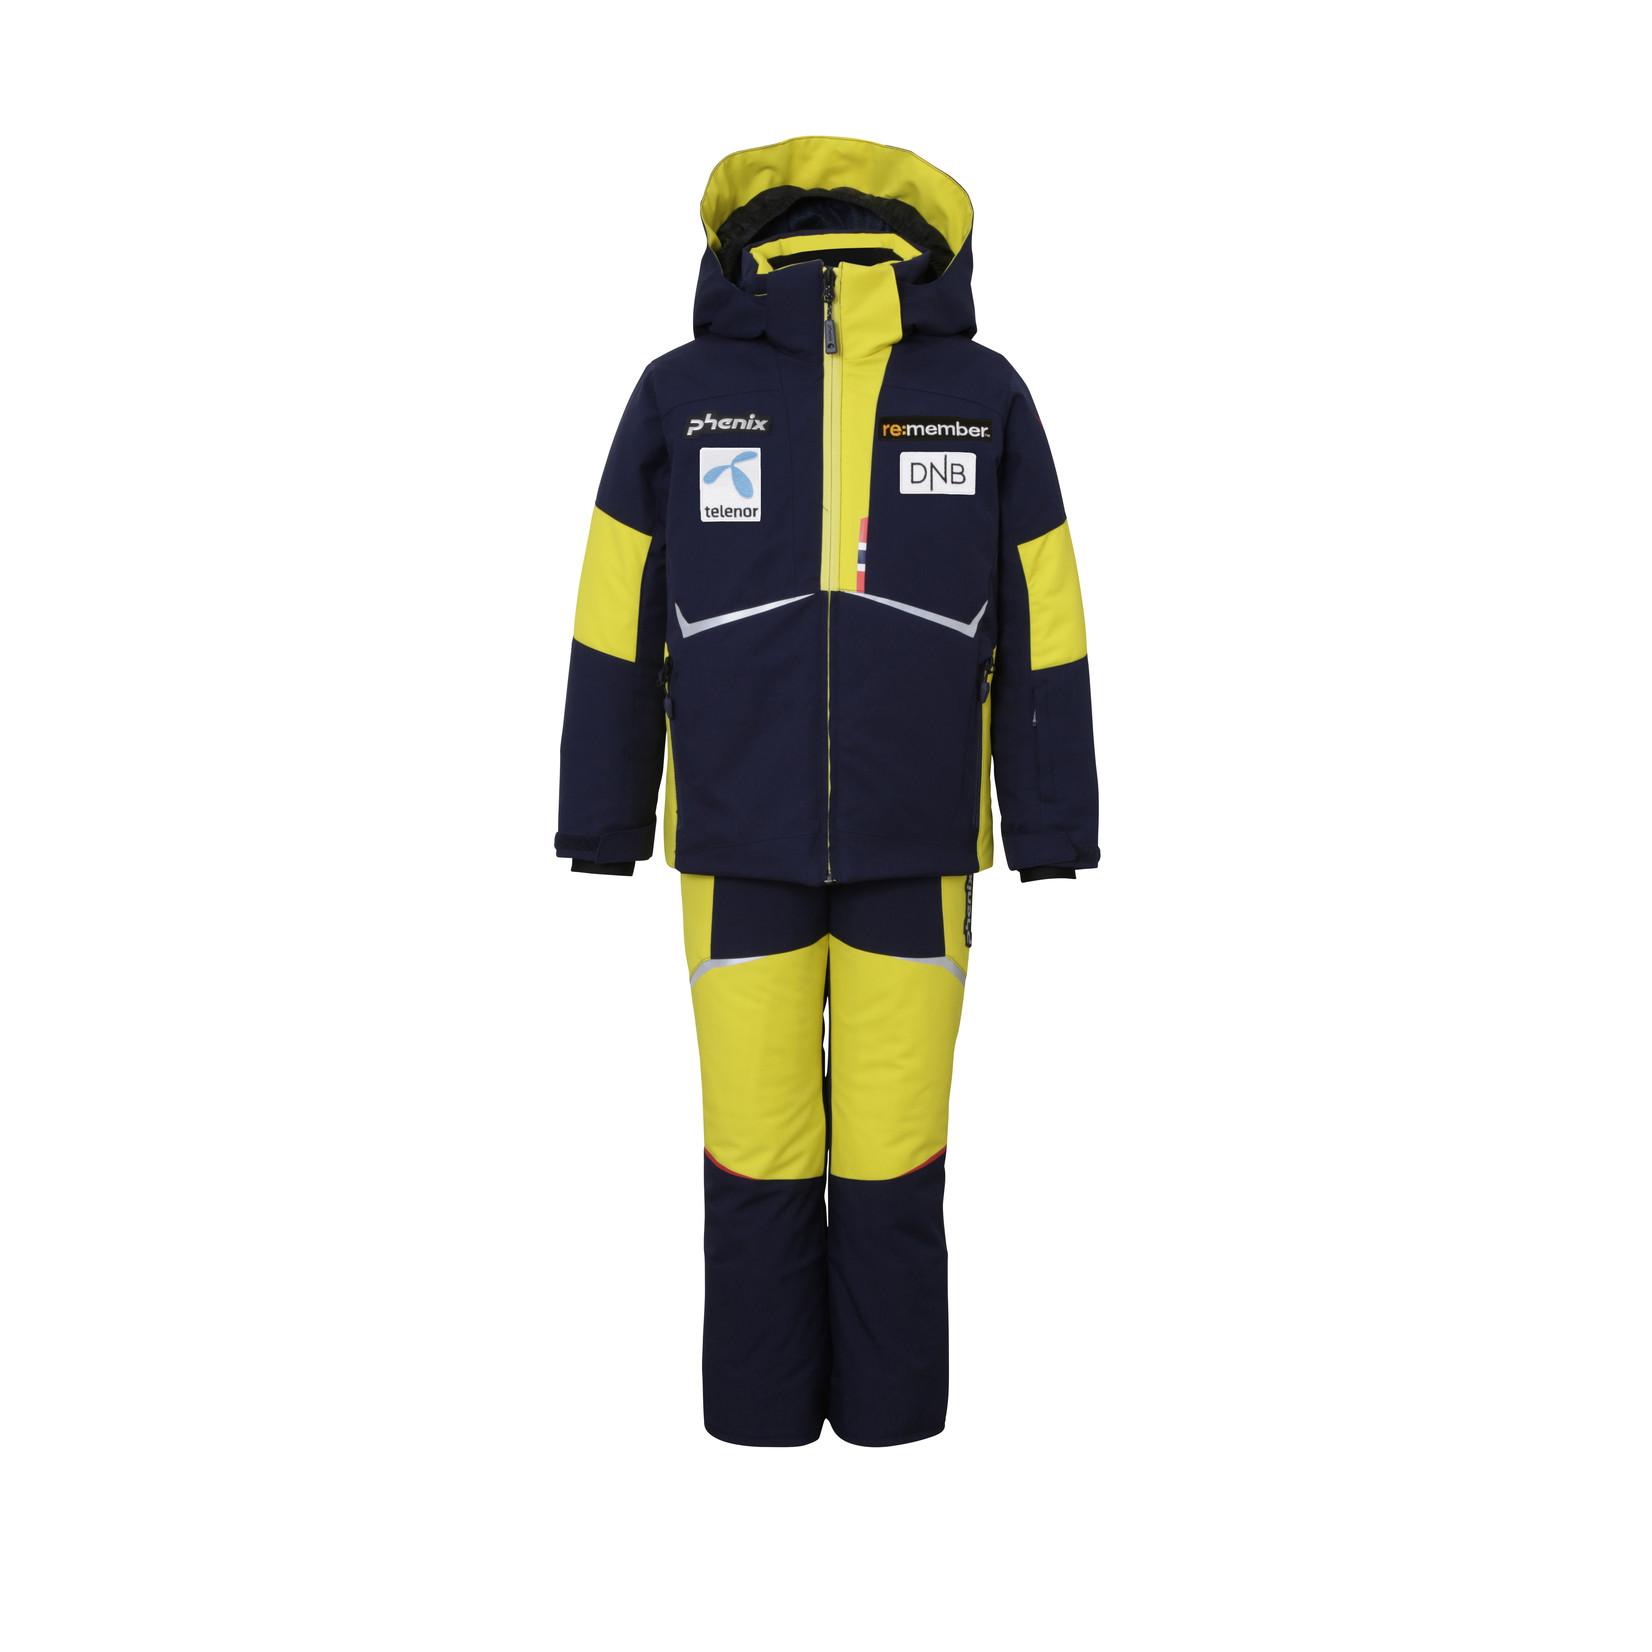 PHENIX Norway Alpine Team Kids Two-Piece